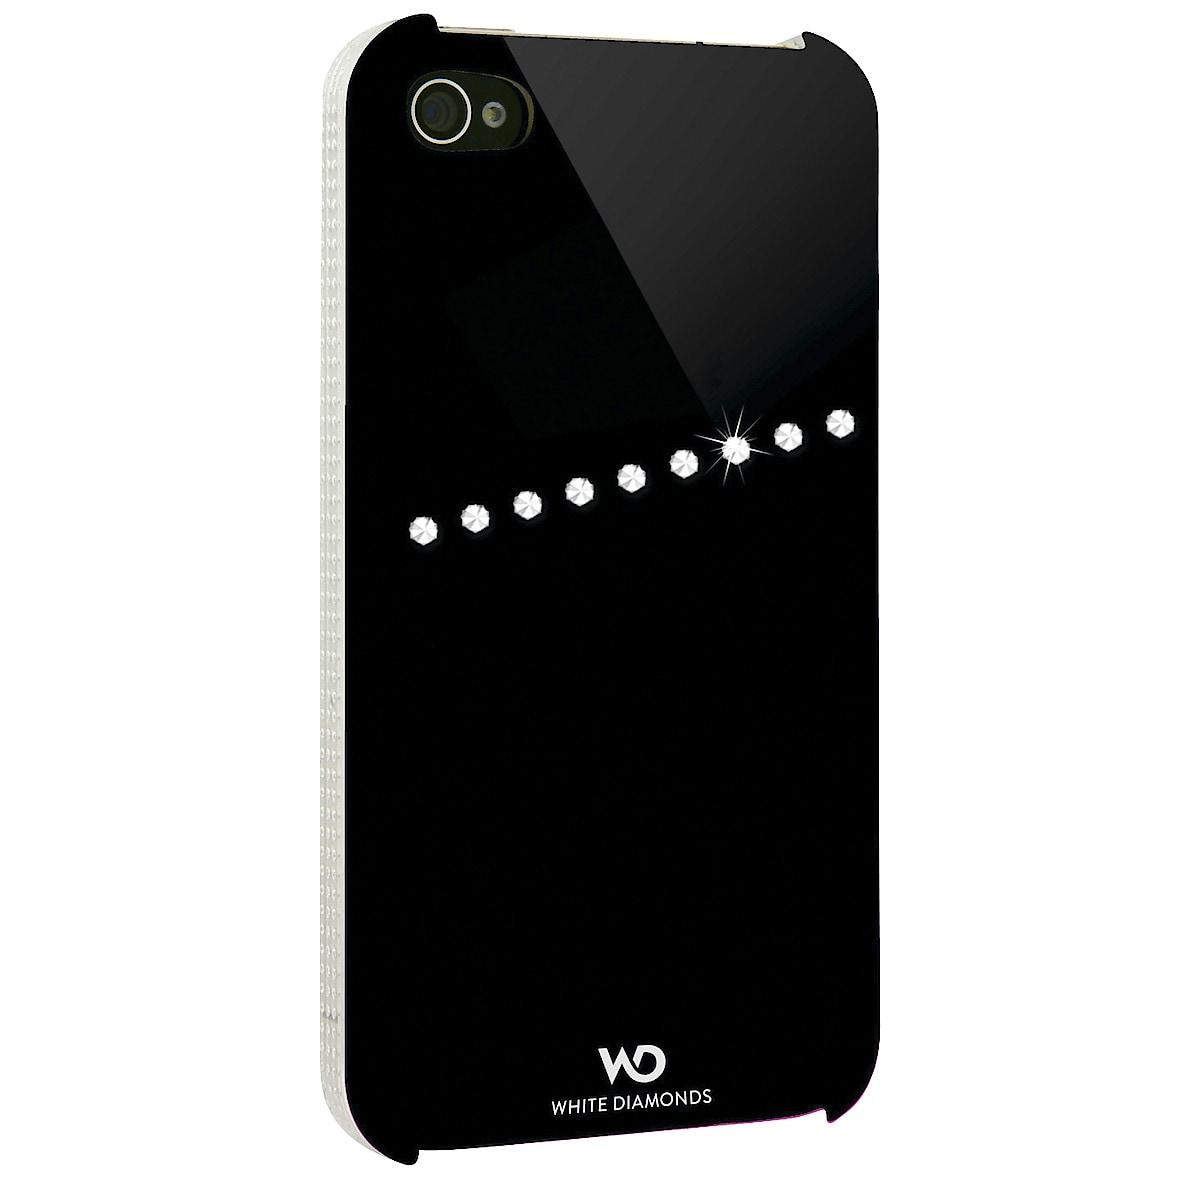 White Diamonds Sash Shell for iPhone 4